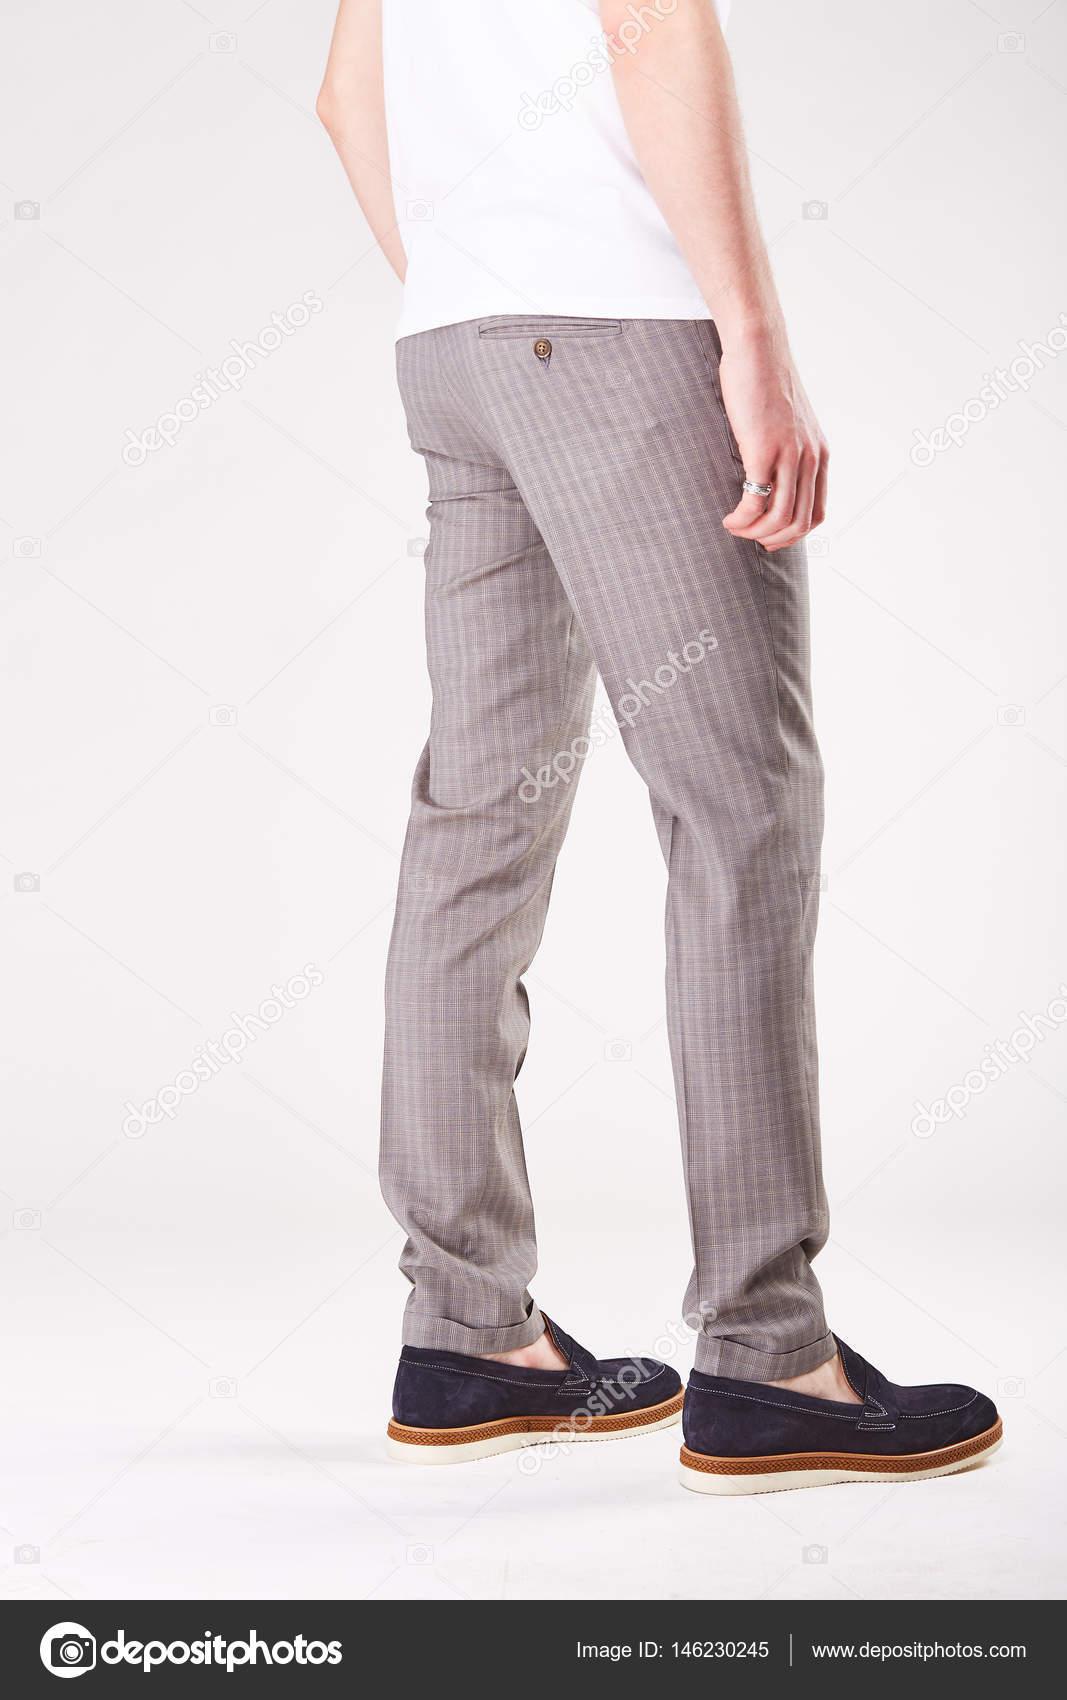 Man Is Posing In Light Studio In Trendy Grey Trousers And Black